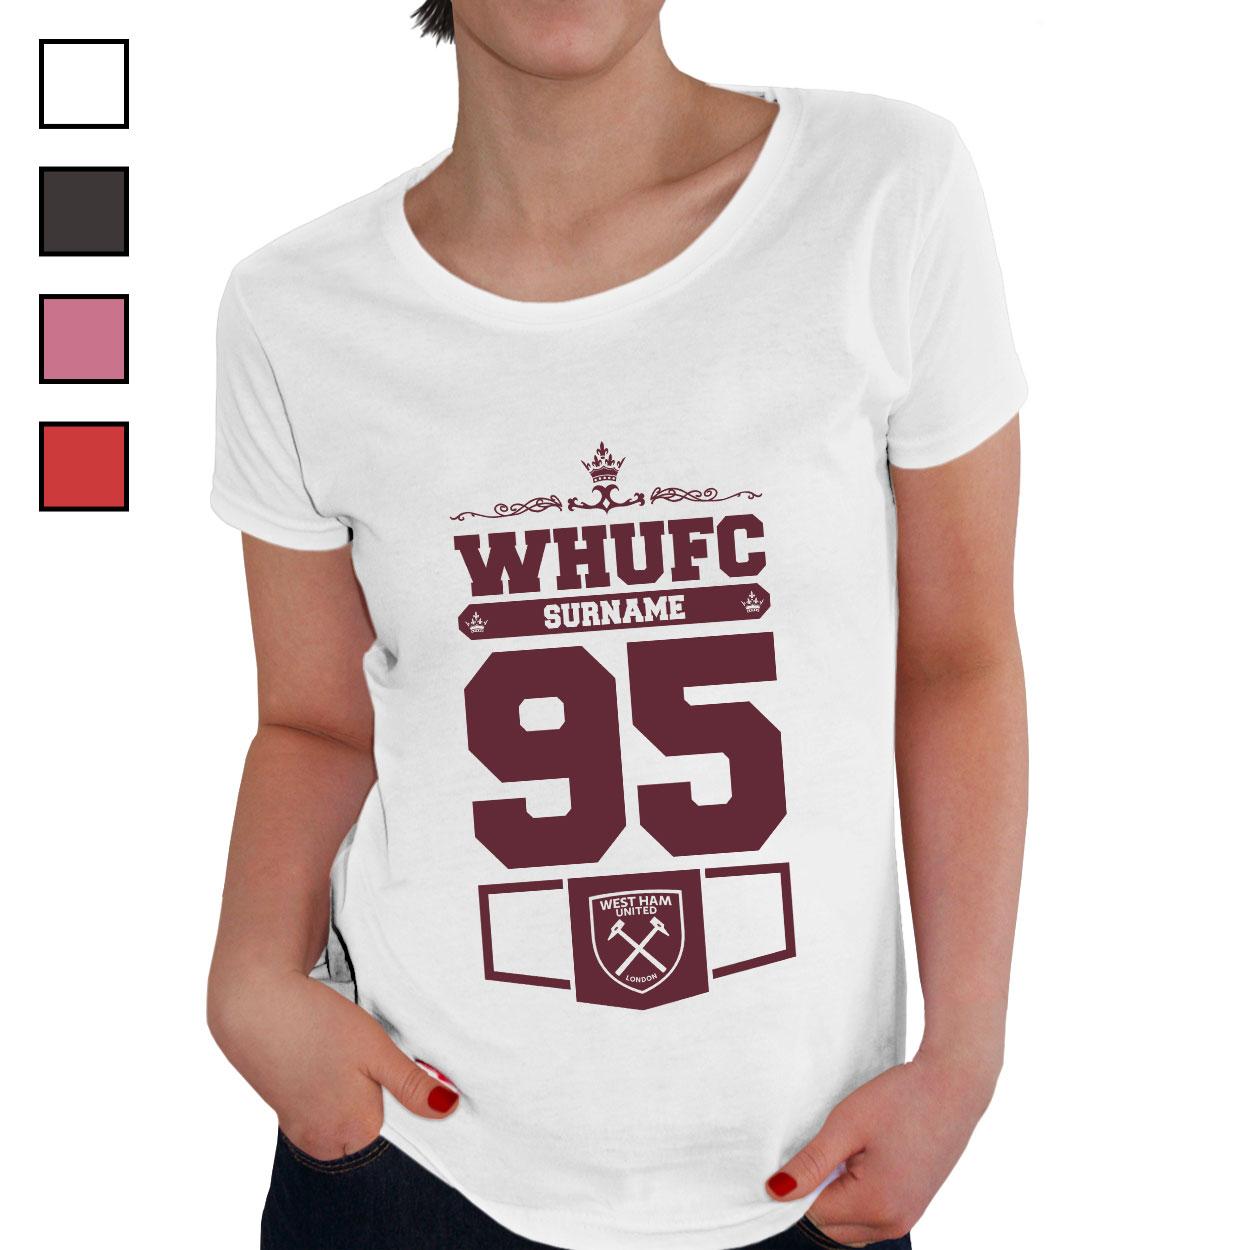 West Ham United FC Ladies Club T-Shirt